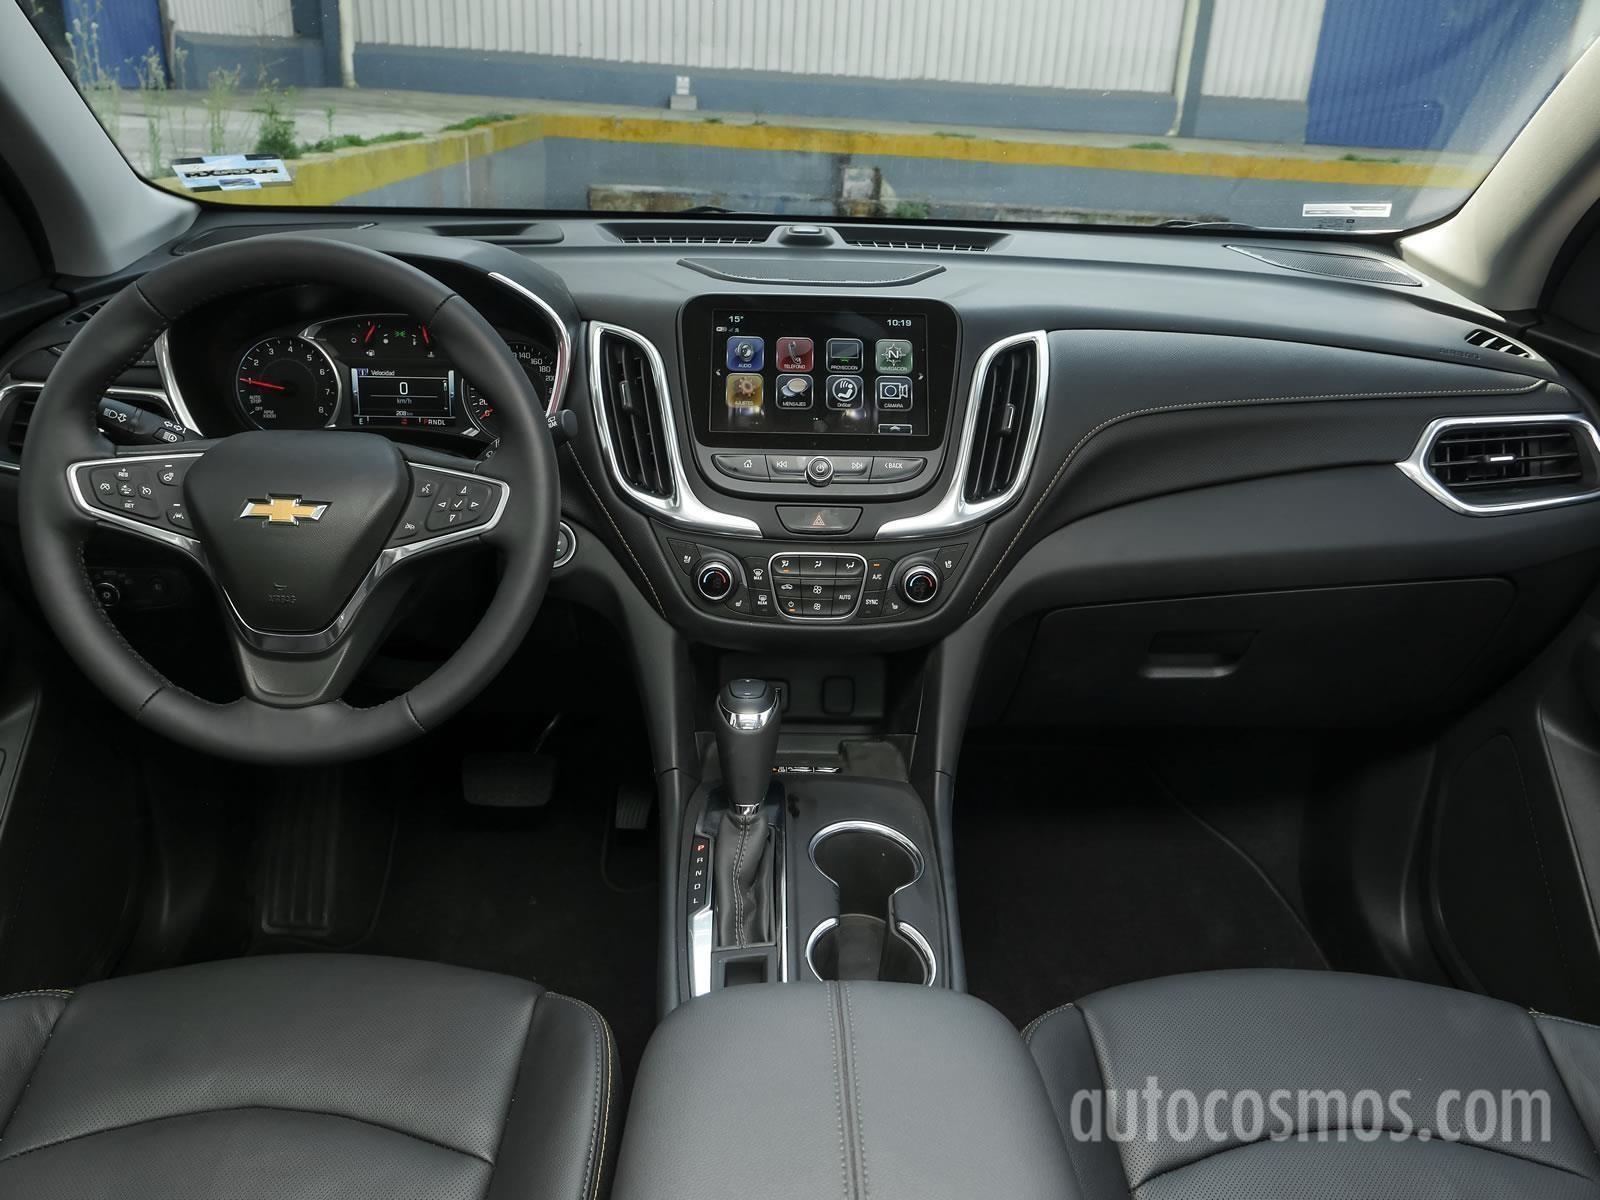 Chevrolet Equinox 2018 Llega A M 233 Xico Desde 456 100 Pesos